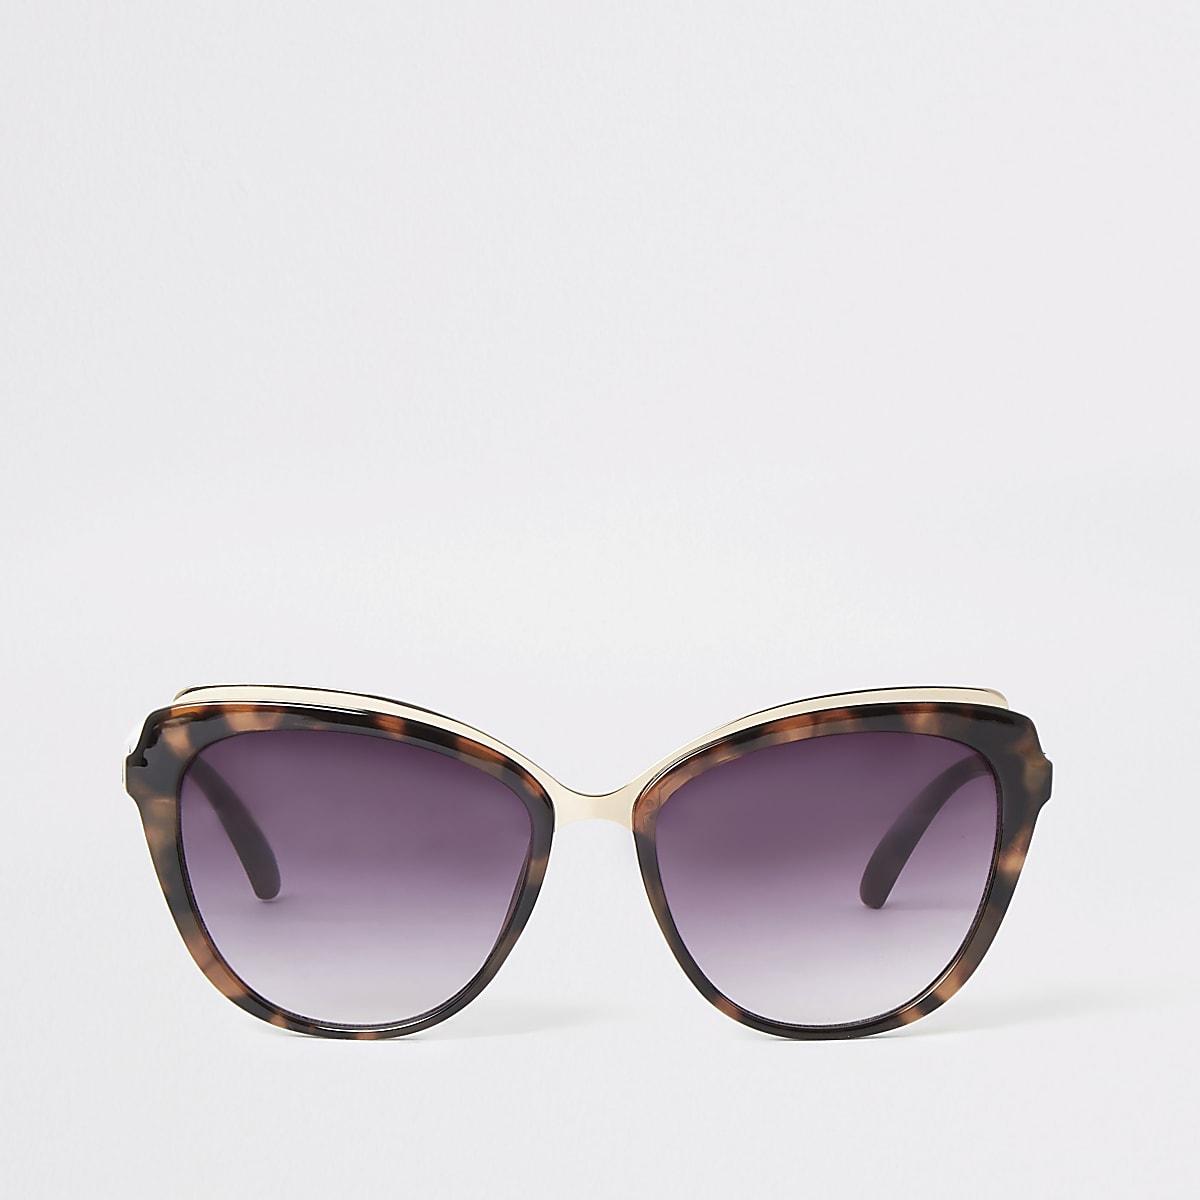 Brown tortoise smoke lens cat eye sunglasses